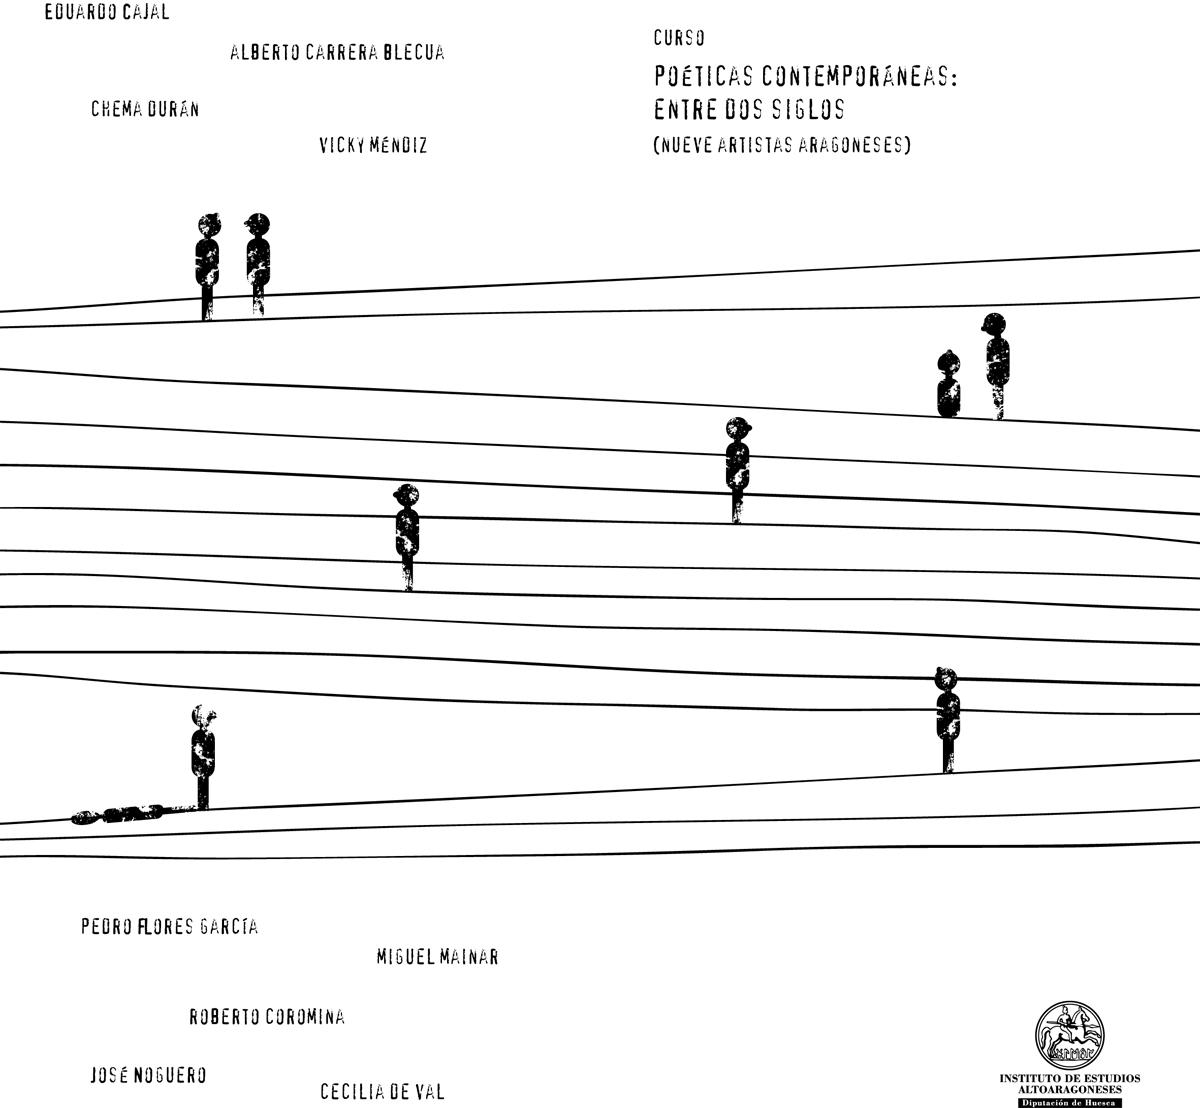 Poéticas contemporáneas. Instituto de Estudios Altoaragoneses.